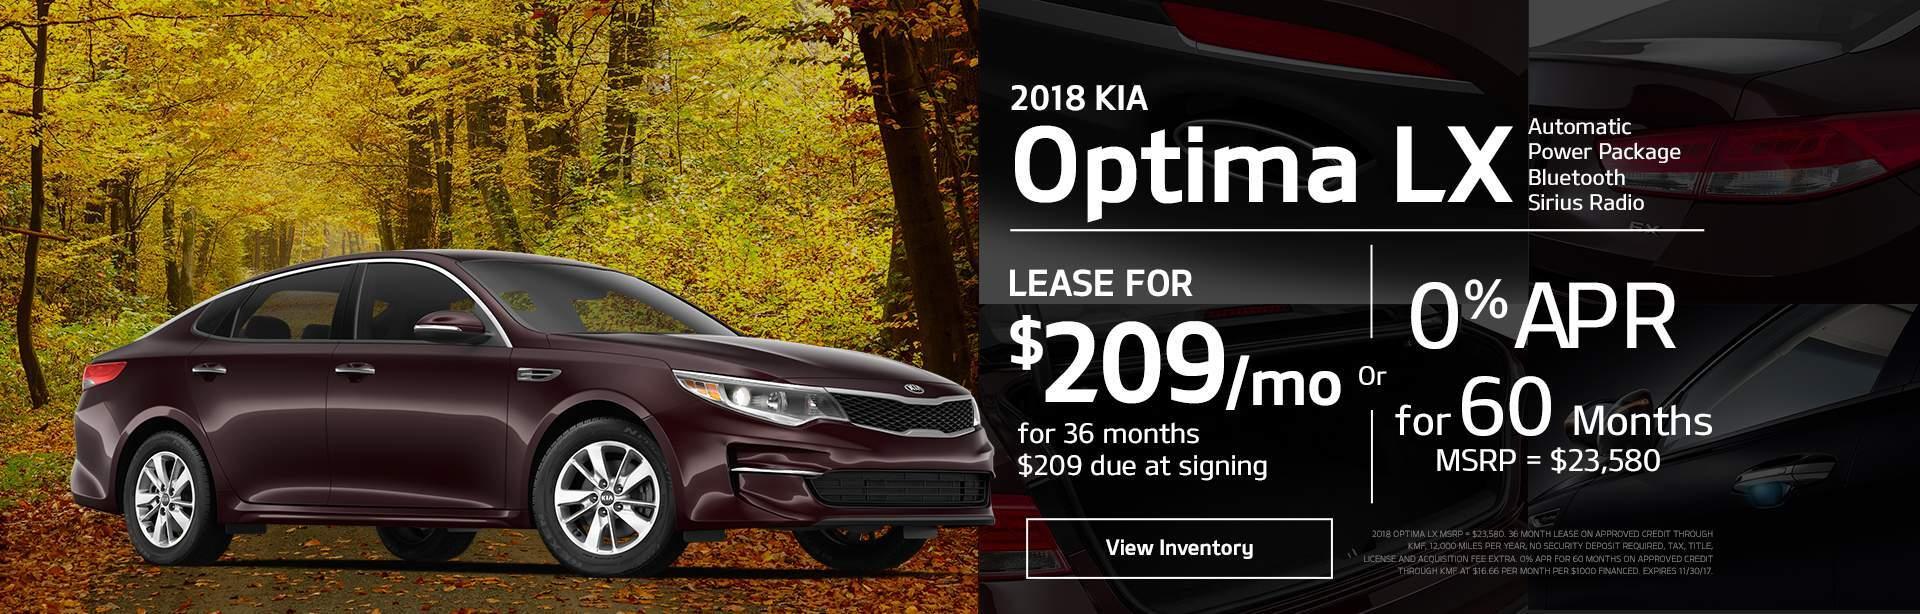 Moritz Kia Fort Worth >> Kia Dealership Fort Worth TX Used Cars Moritz Kia Dealerships